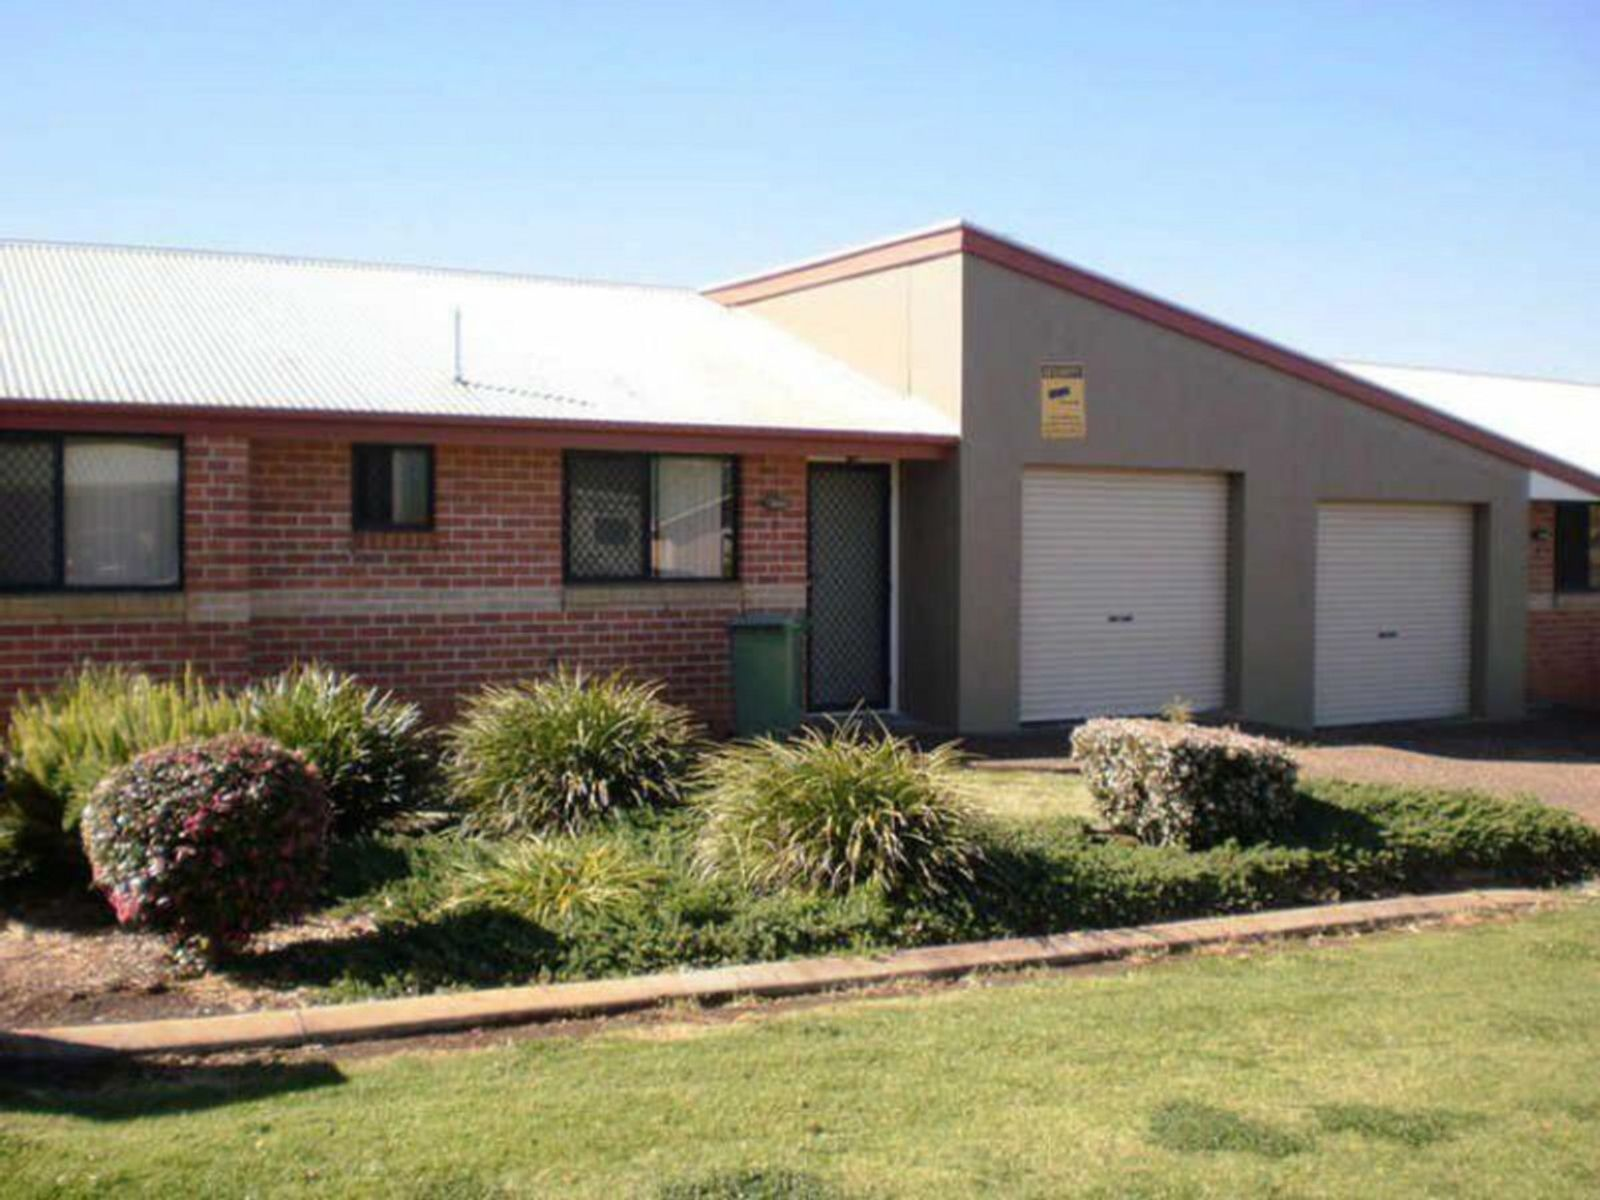 14/15 Donna Court, Kearneys Spring, QLD 4350